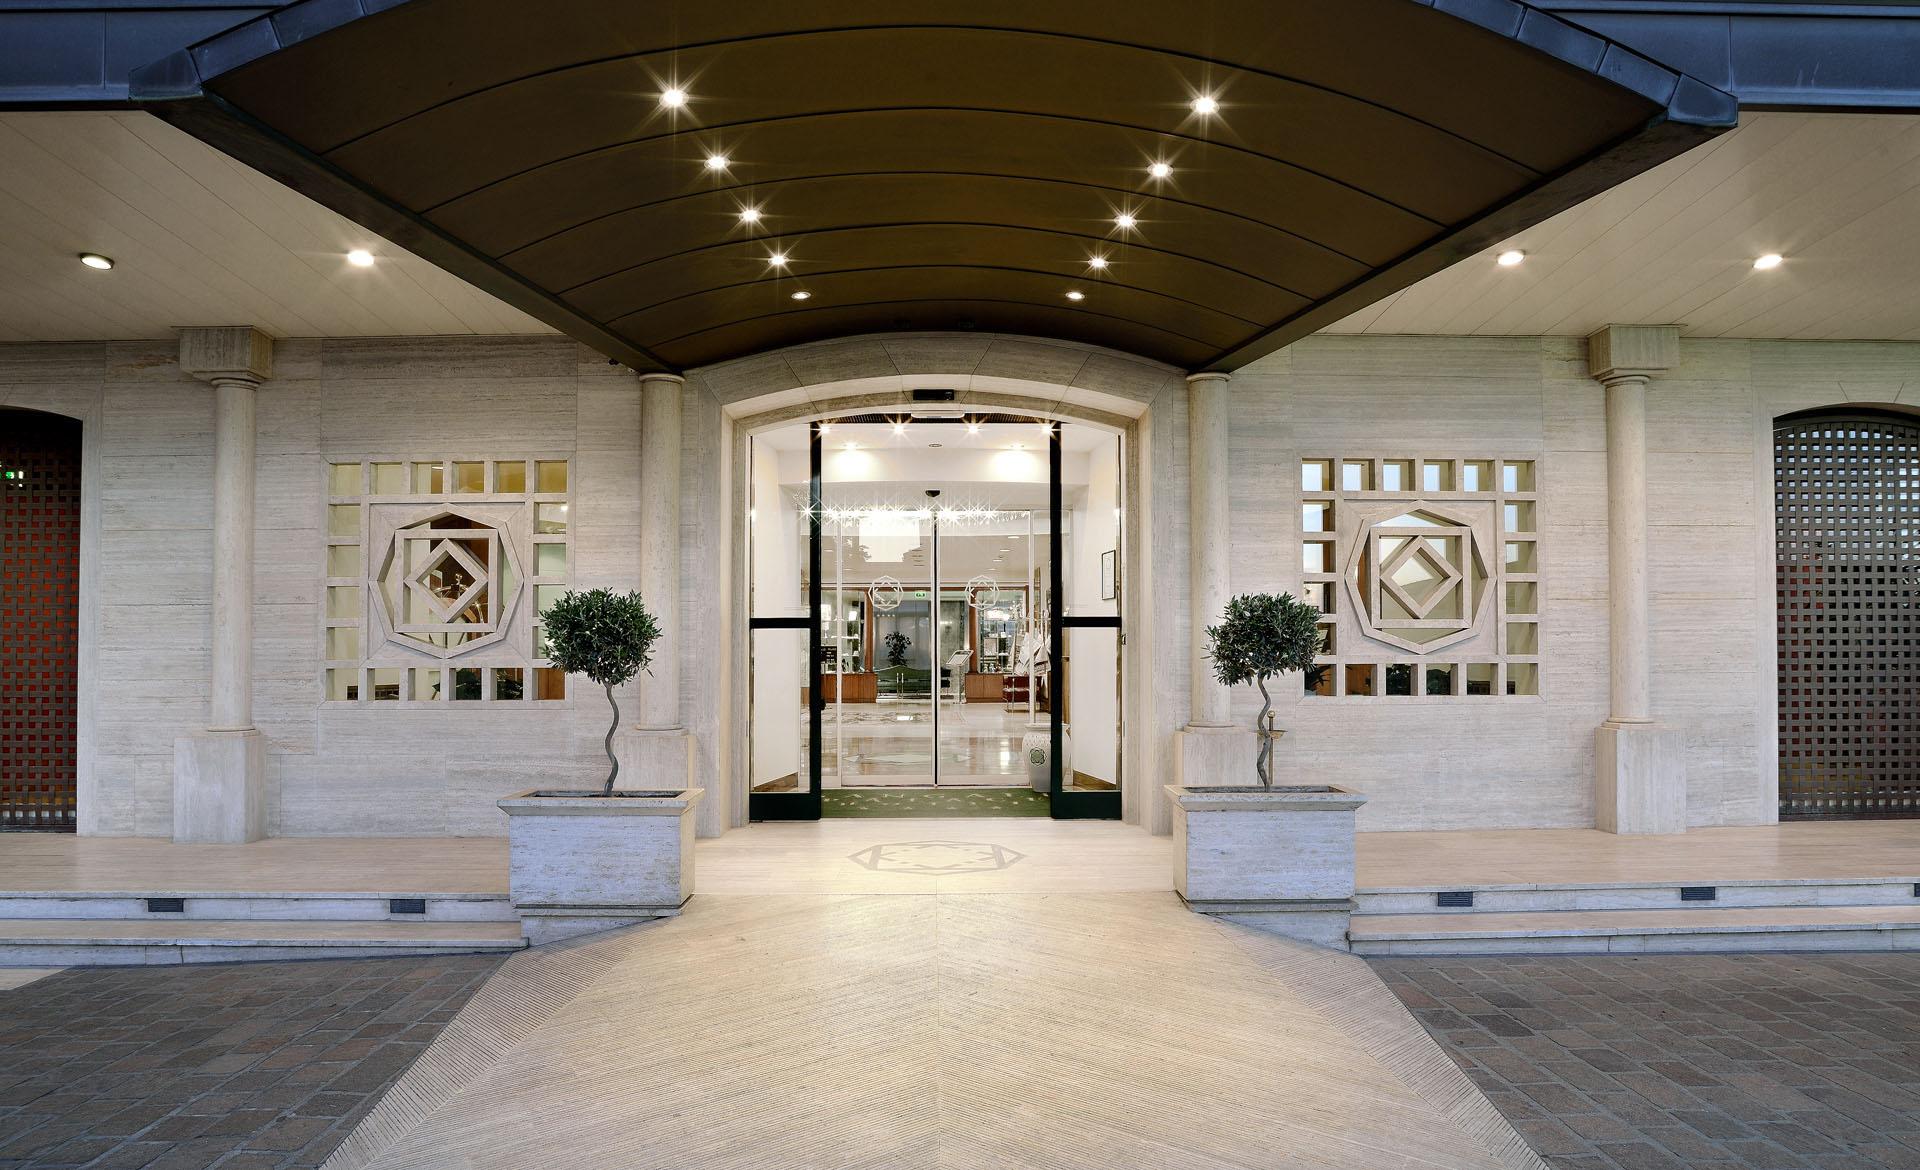 hotel sangallo palace perugia recensioni trattoria - photo#25